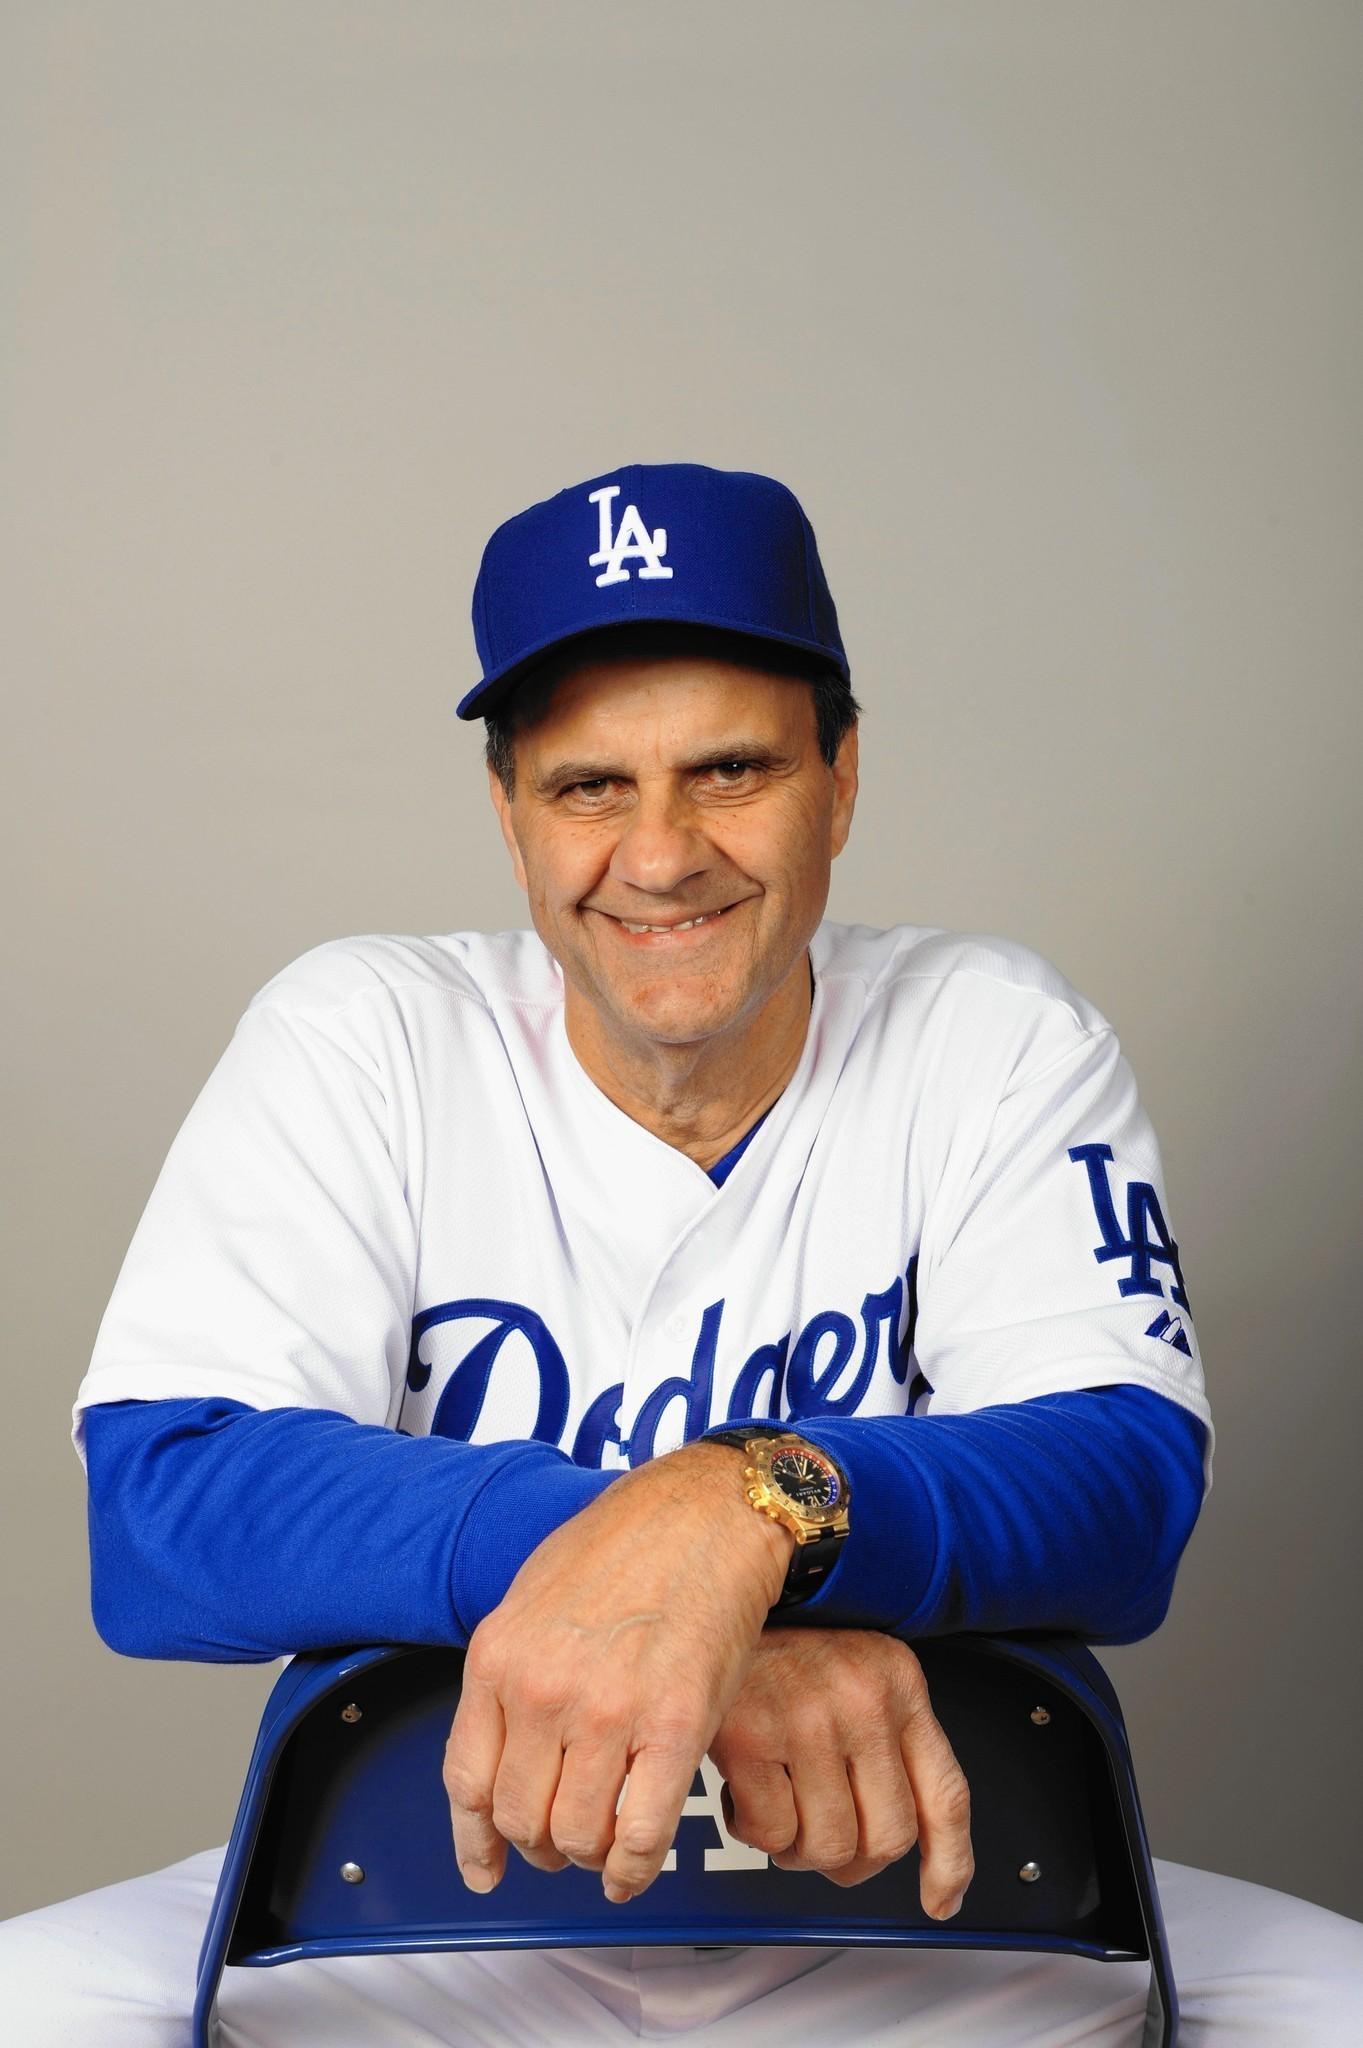 Baseball's Joe Torre hits a home run with his charity work - LA Times